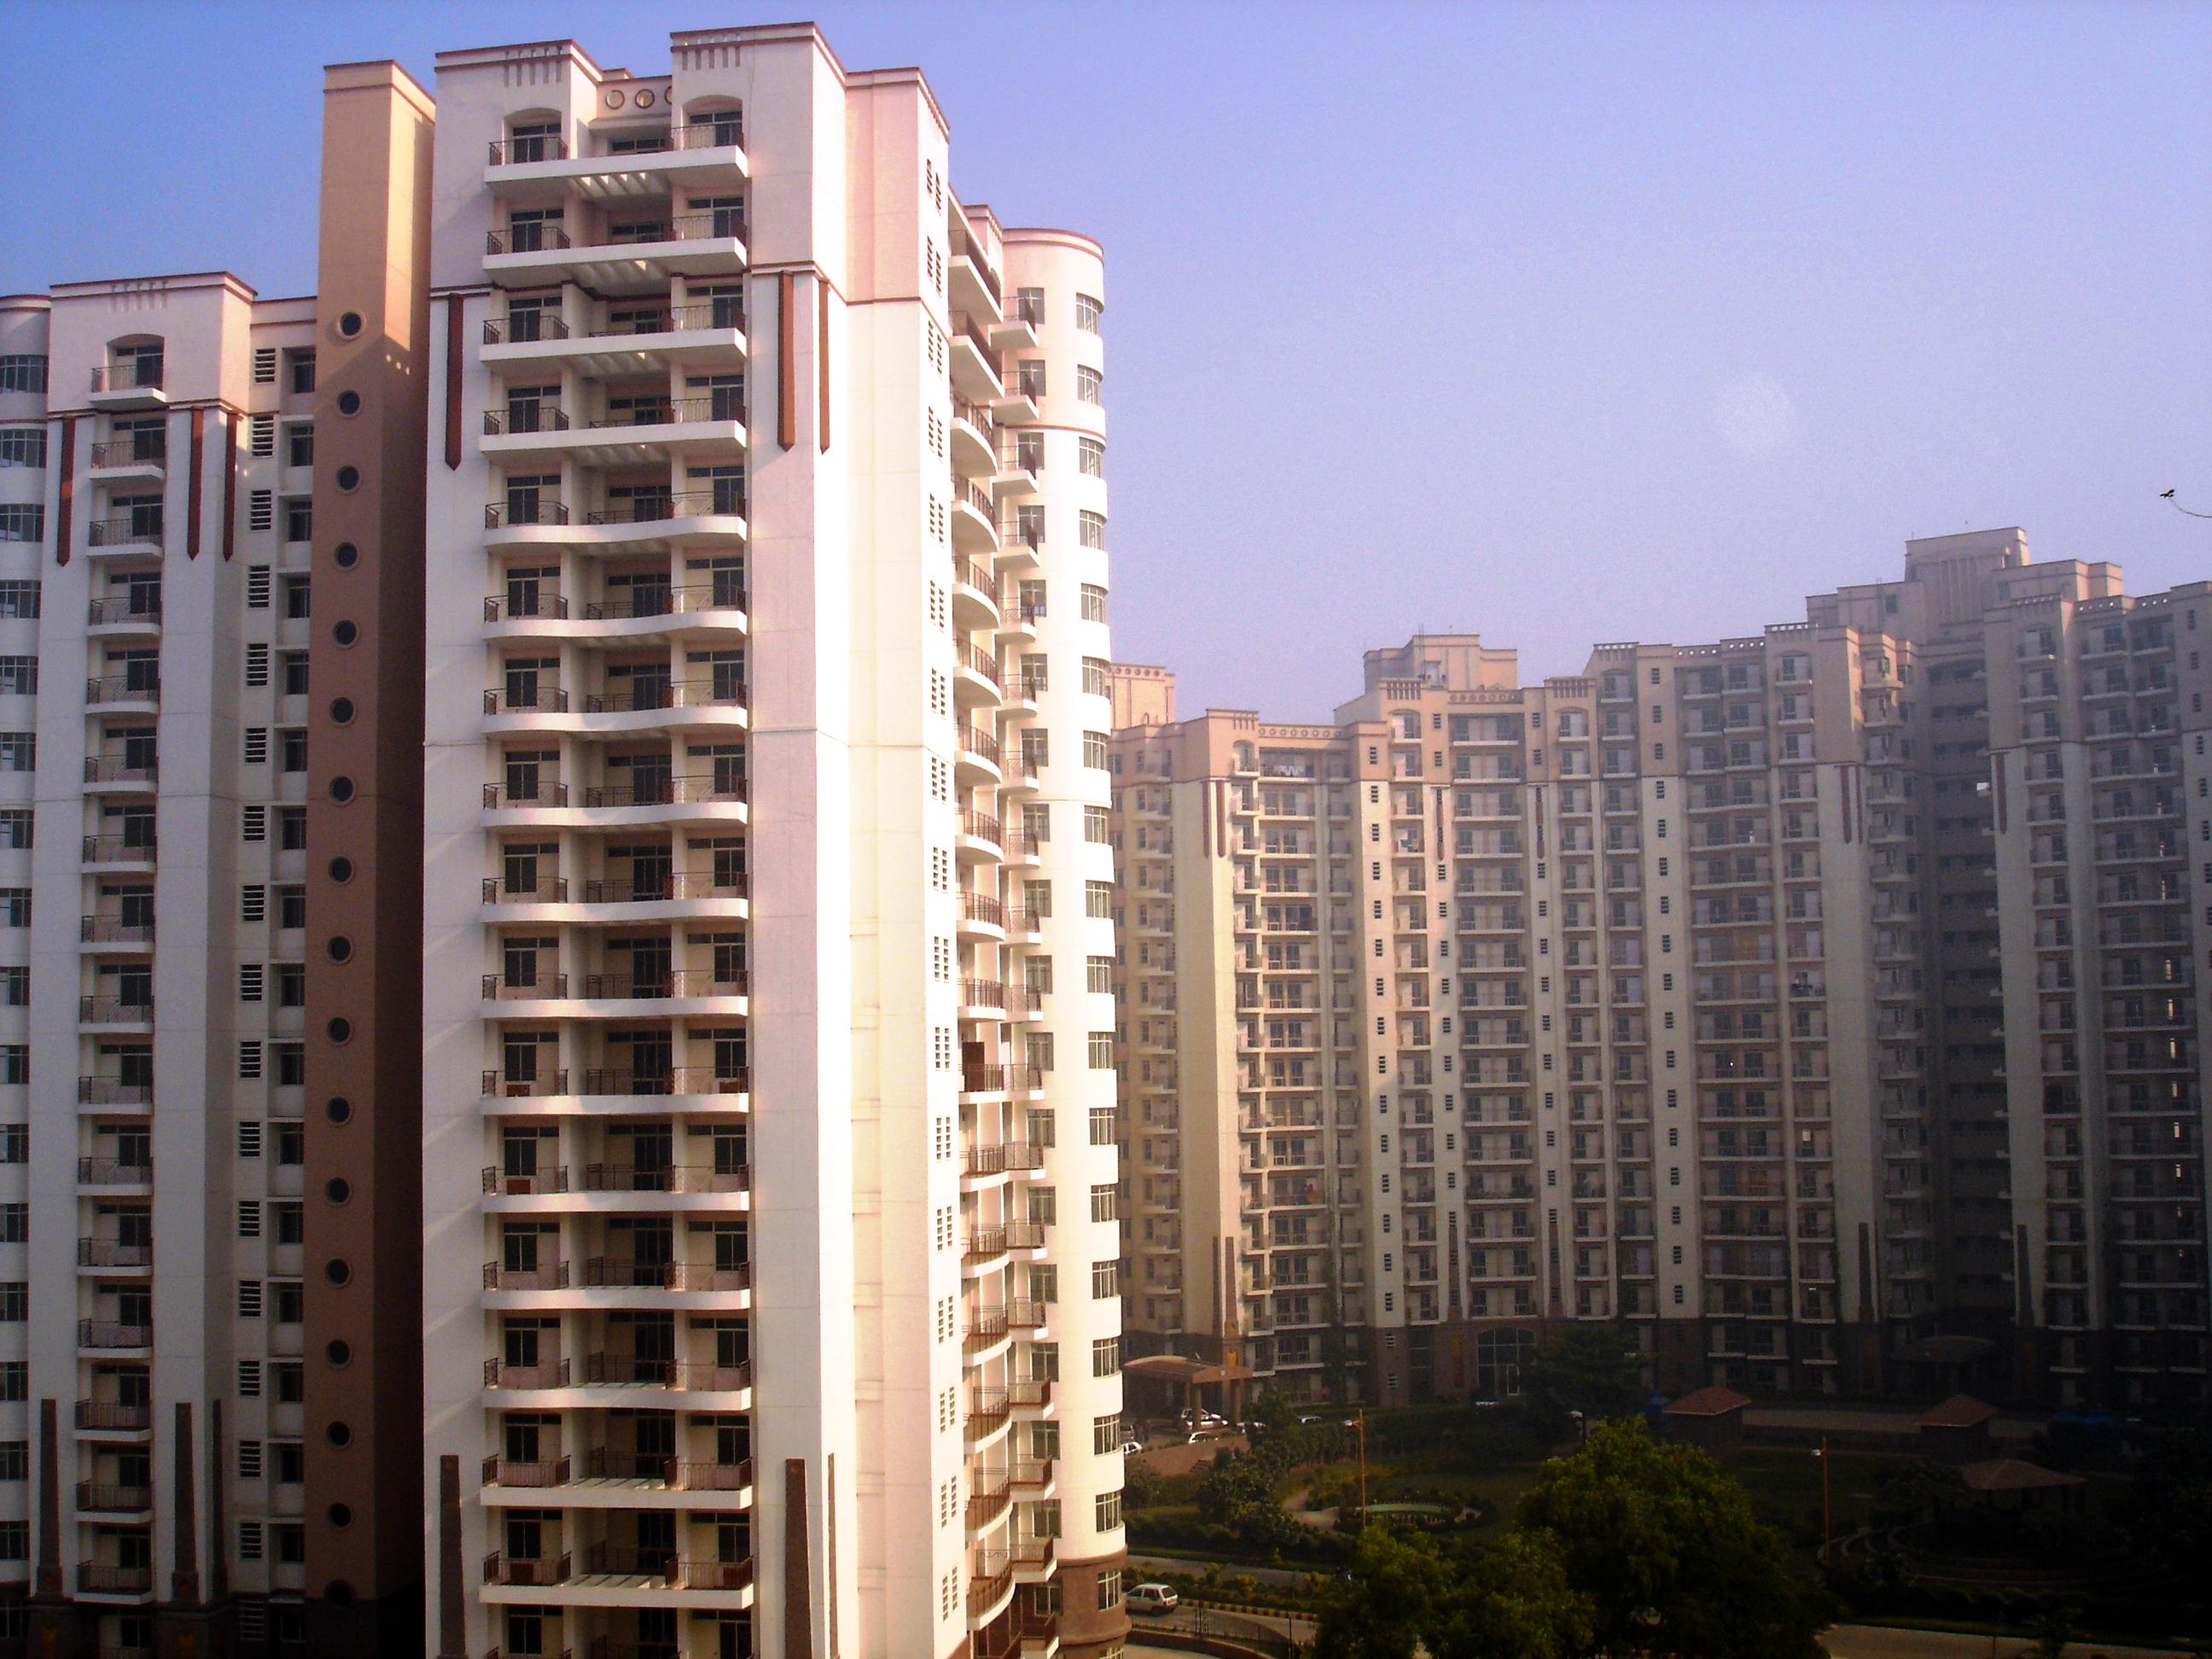 Low Efficiency Apartments